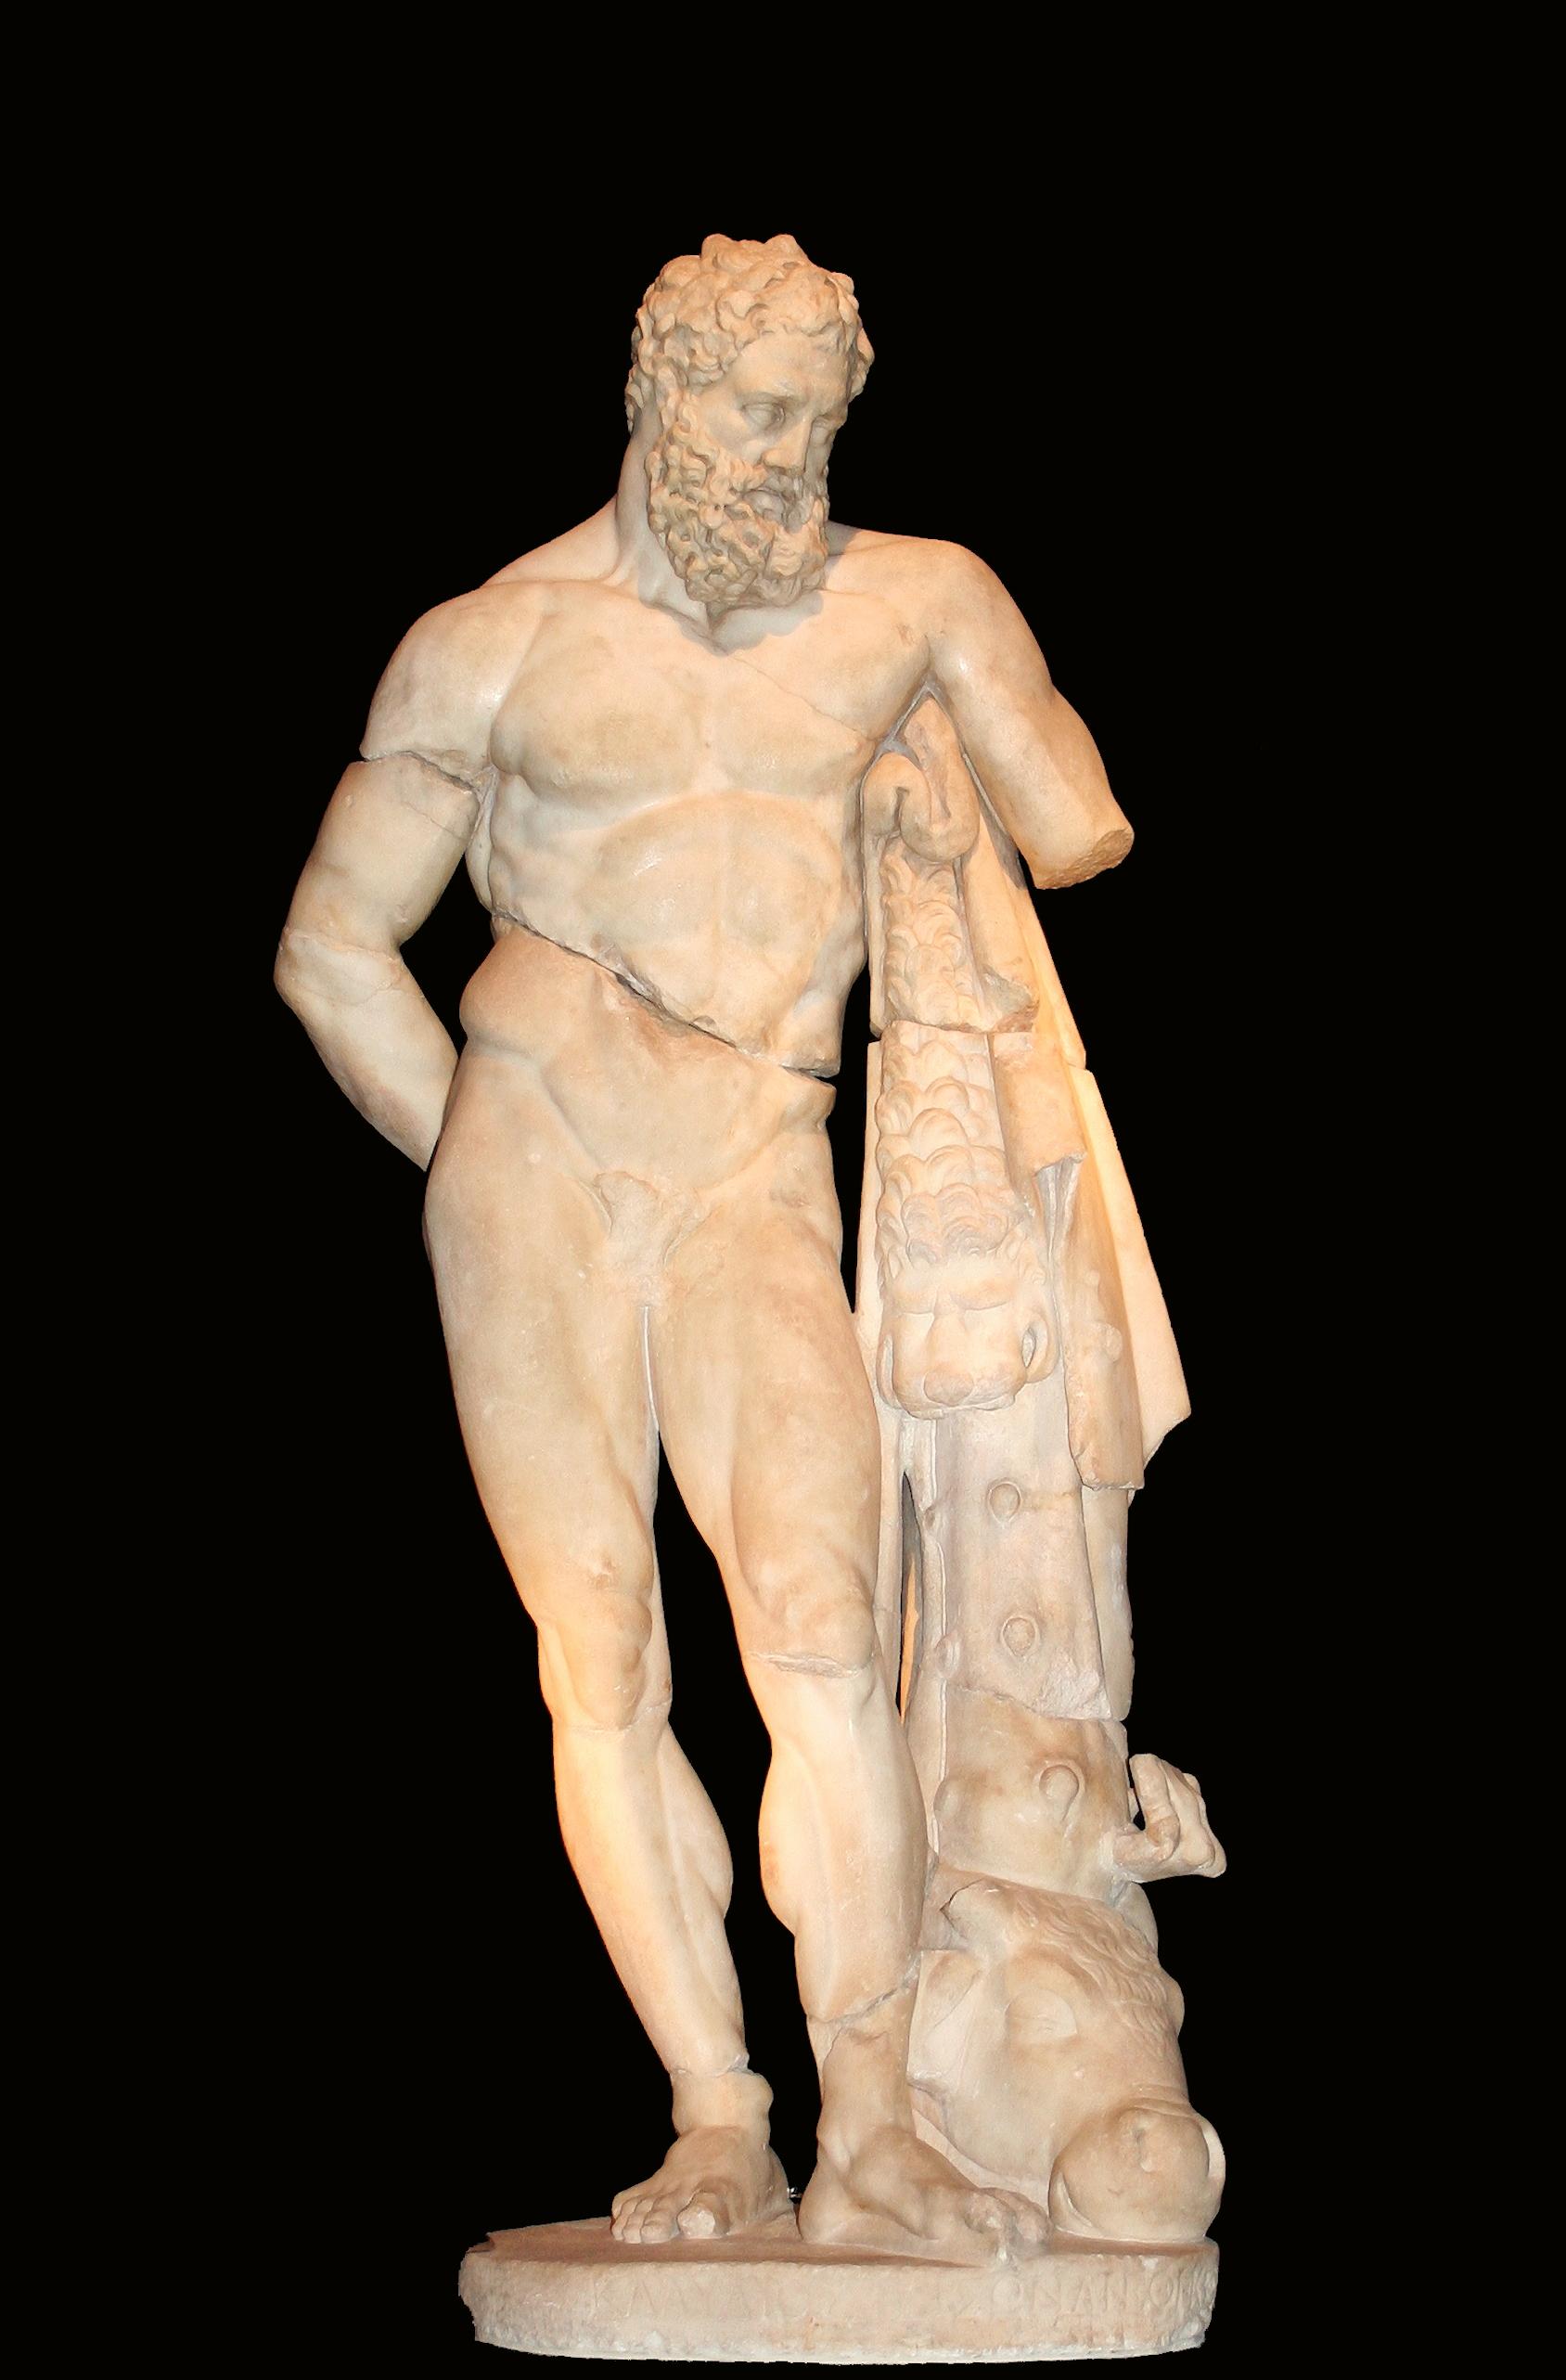 File:Antalya Museum - Weary Hercules.jpg - Wikimedia Commons